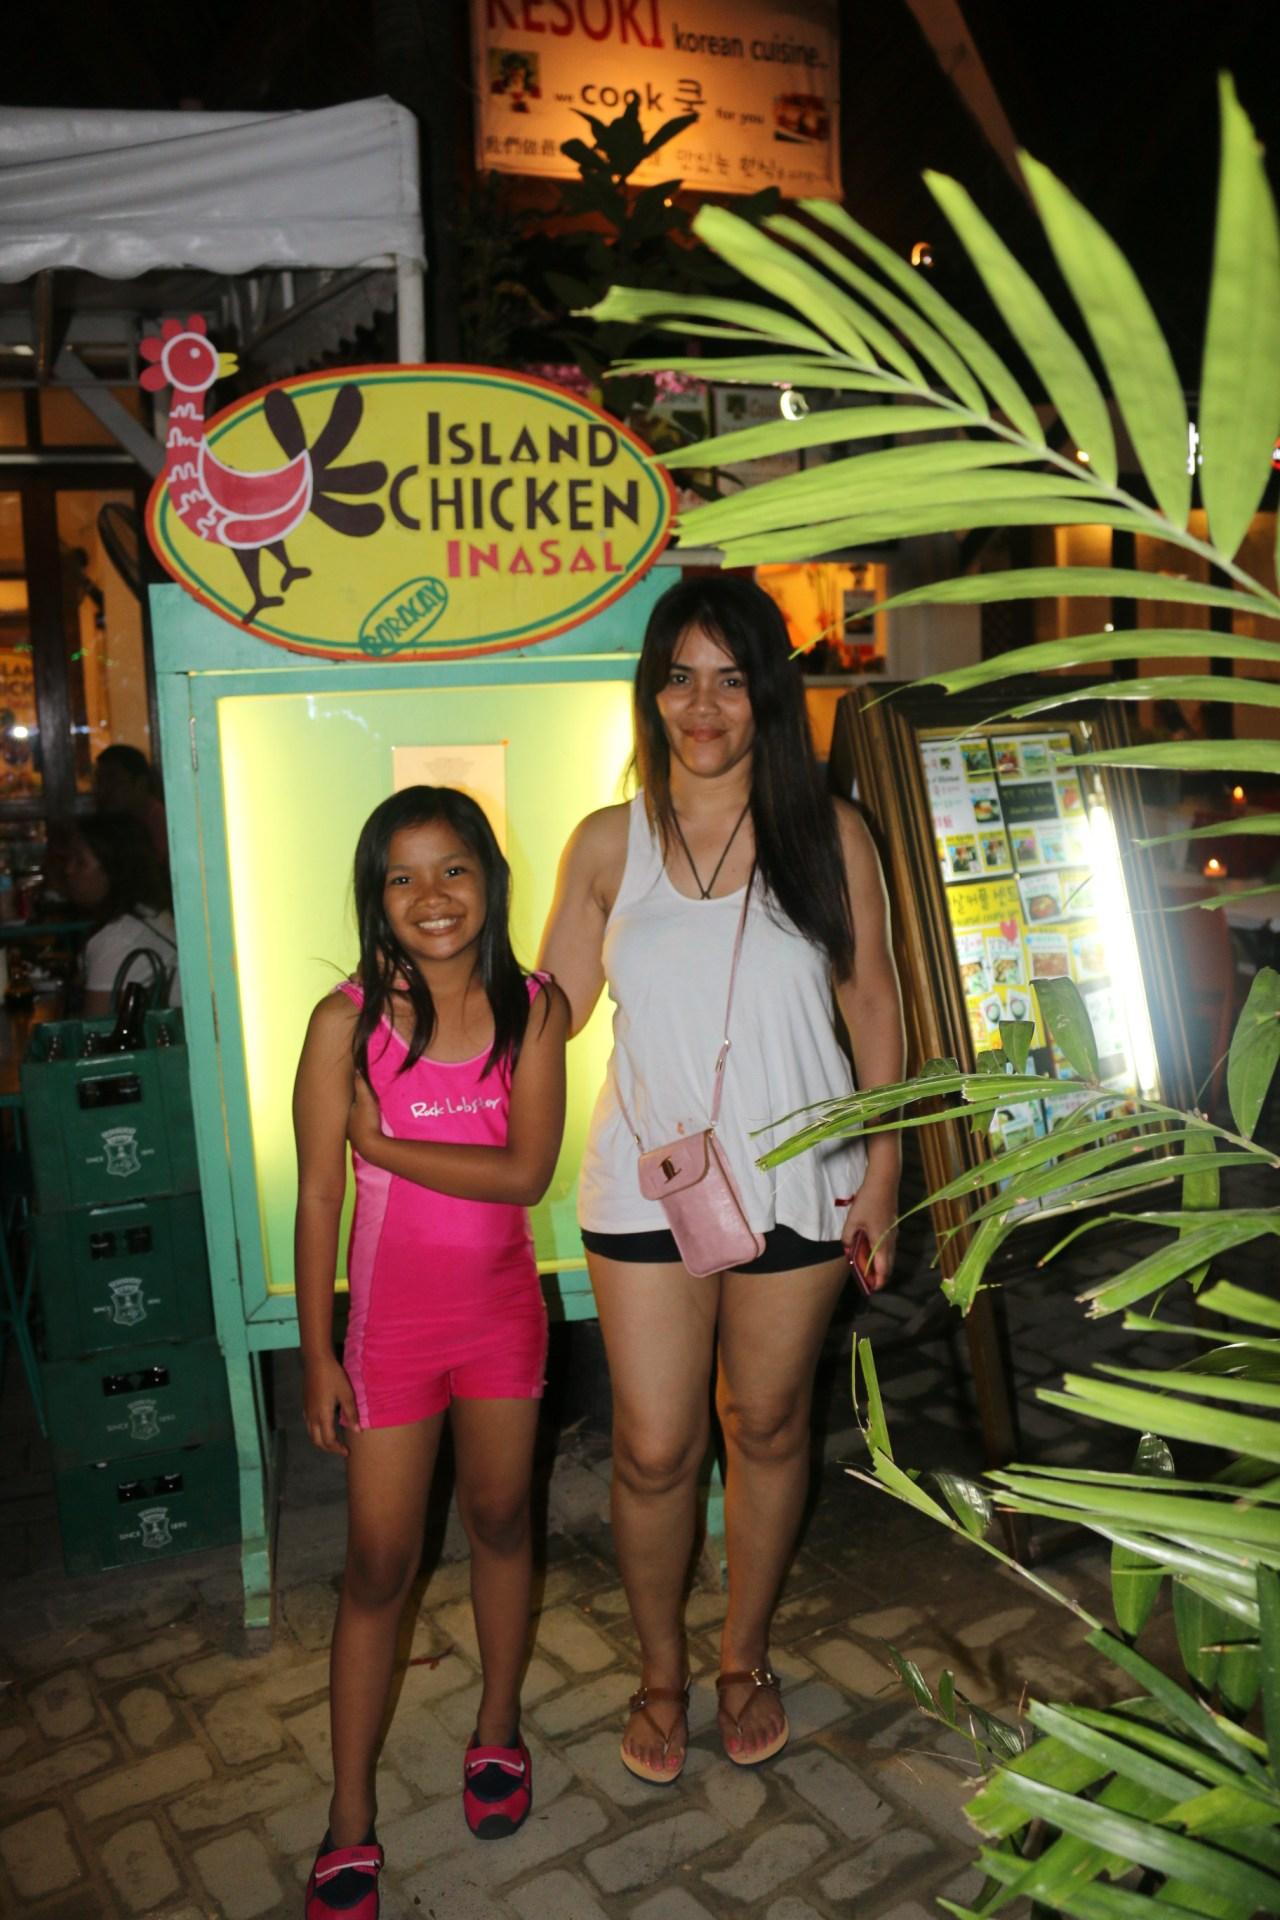 island chicken inasal